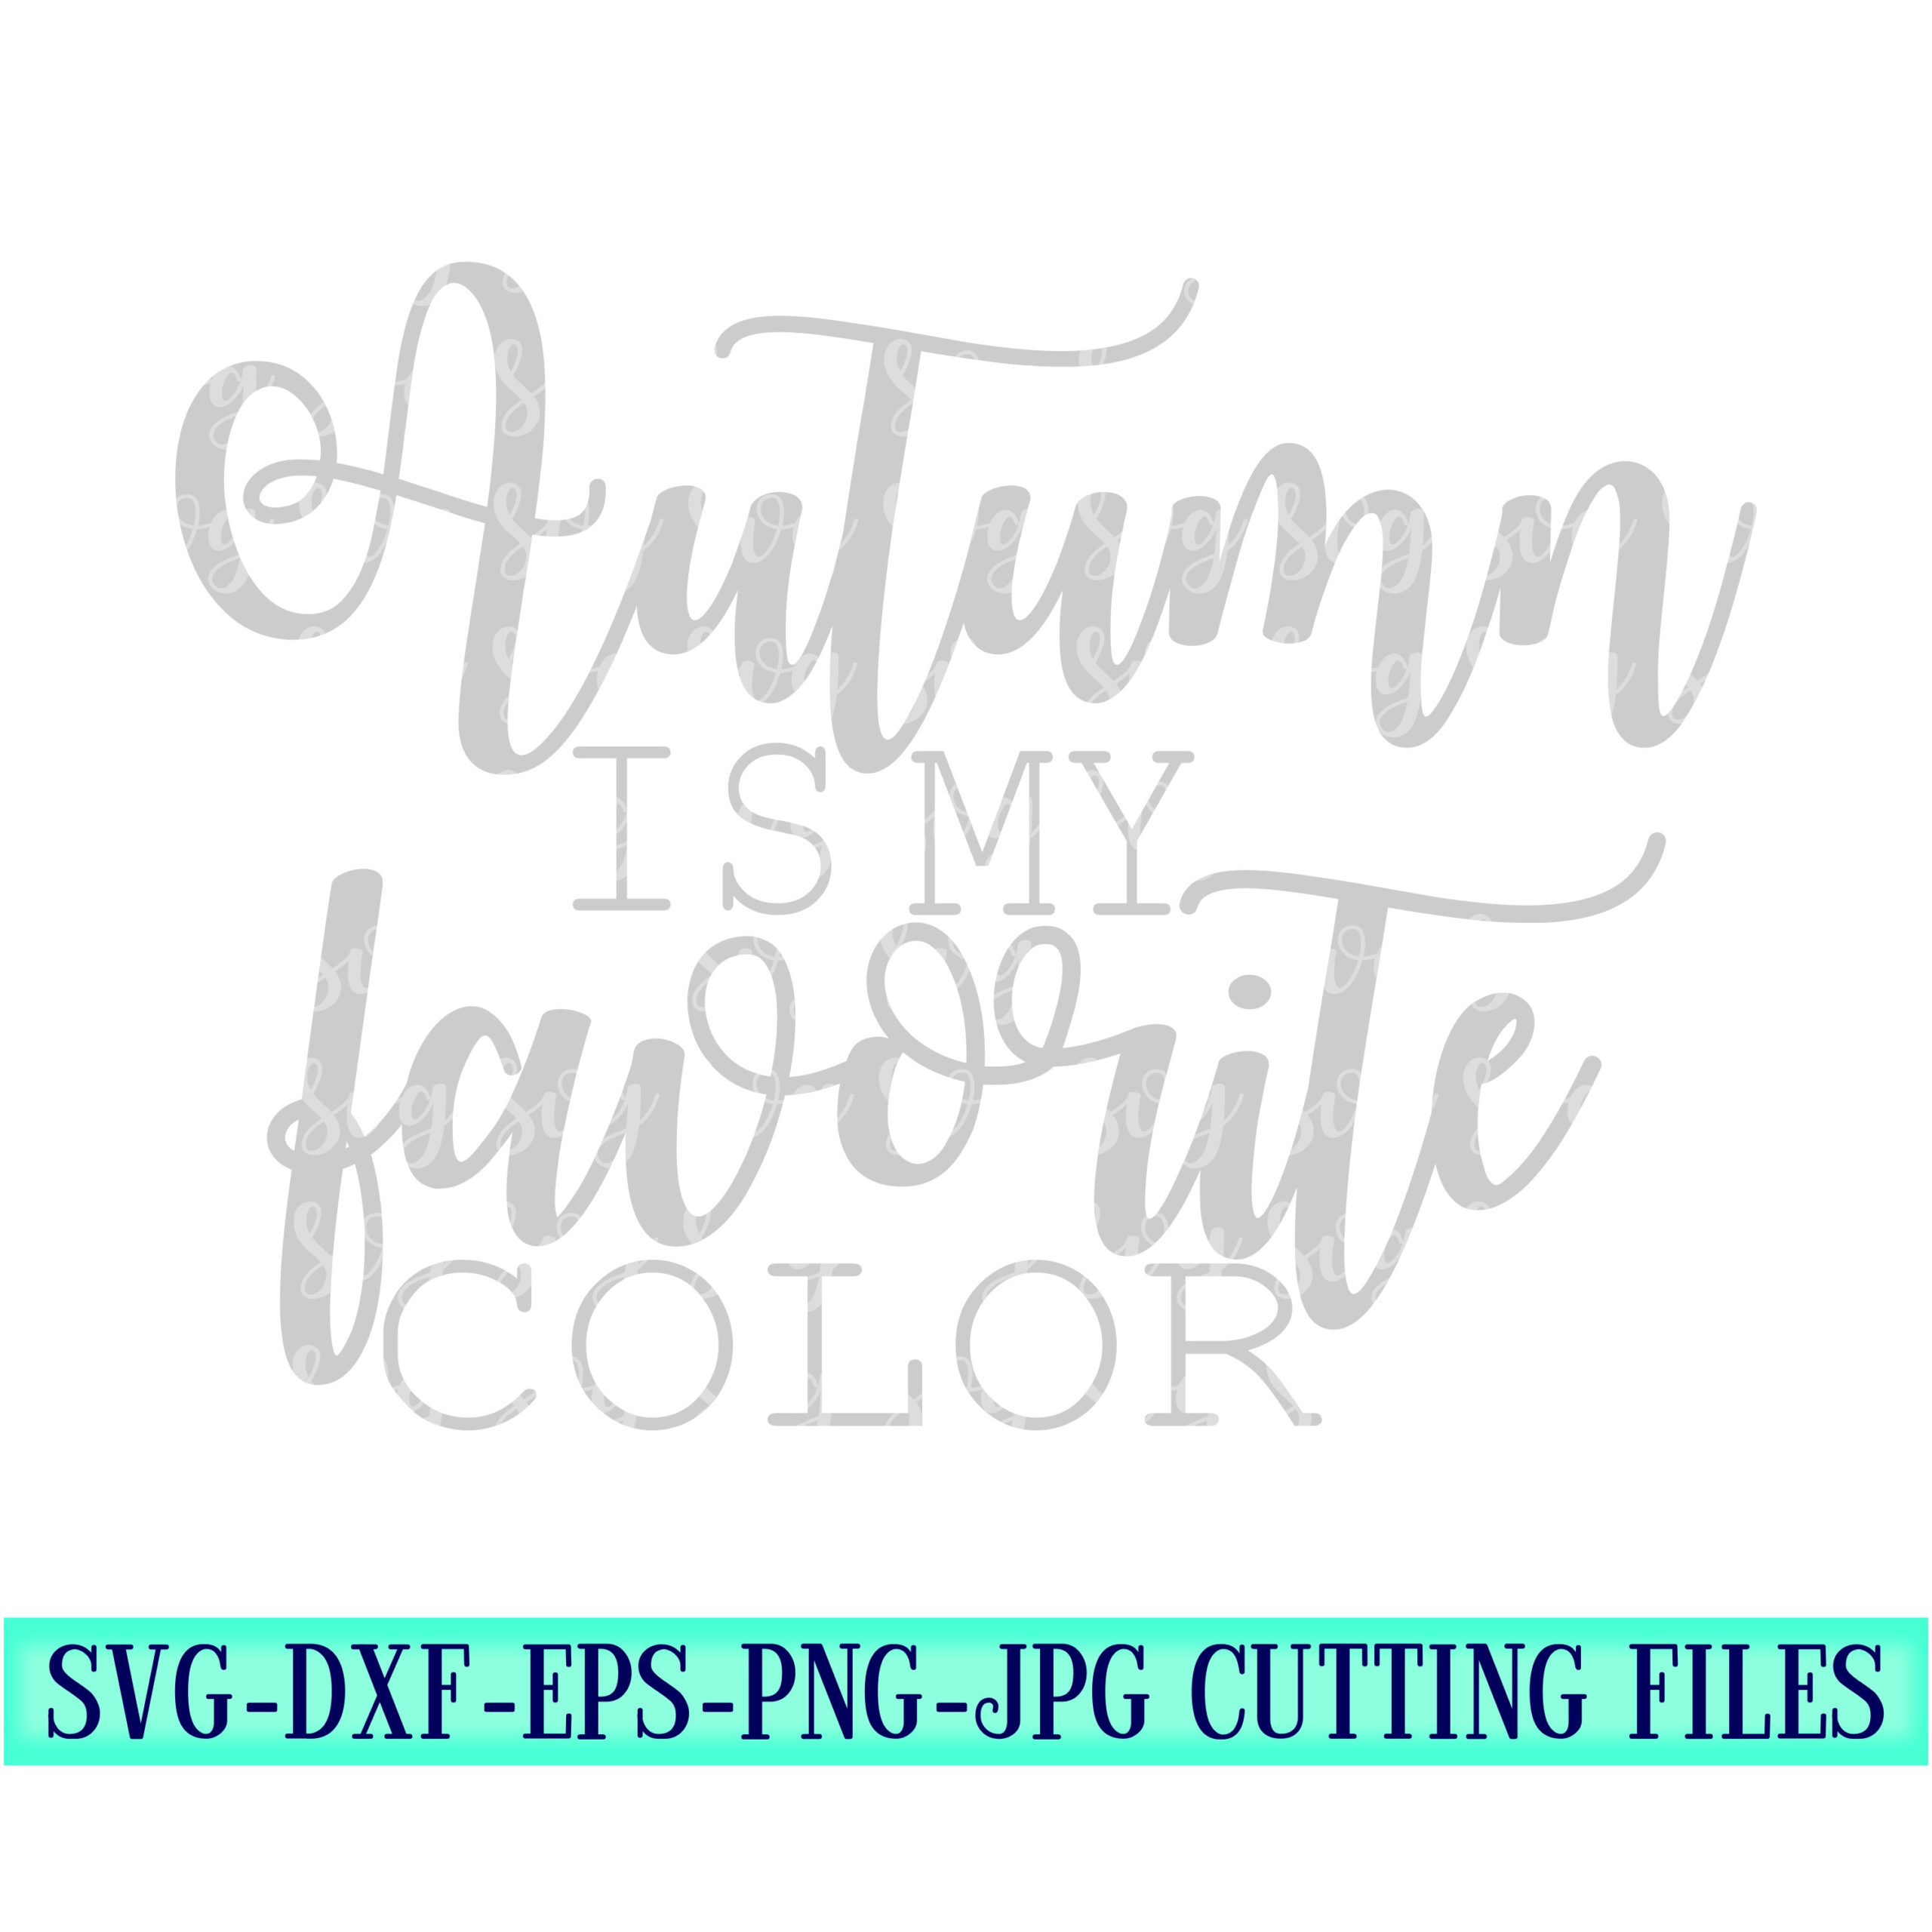 Autumn-is-my-favorite-svg-fall-svg-autumn-svg-fall-sayingsfall-svg-designsfall-cut-filescricut-fall-designscricut-svgsvg-for-mobile-5f6f716a